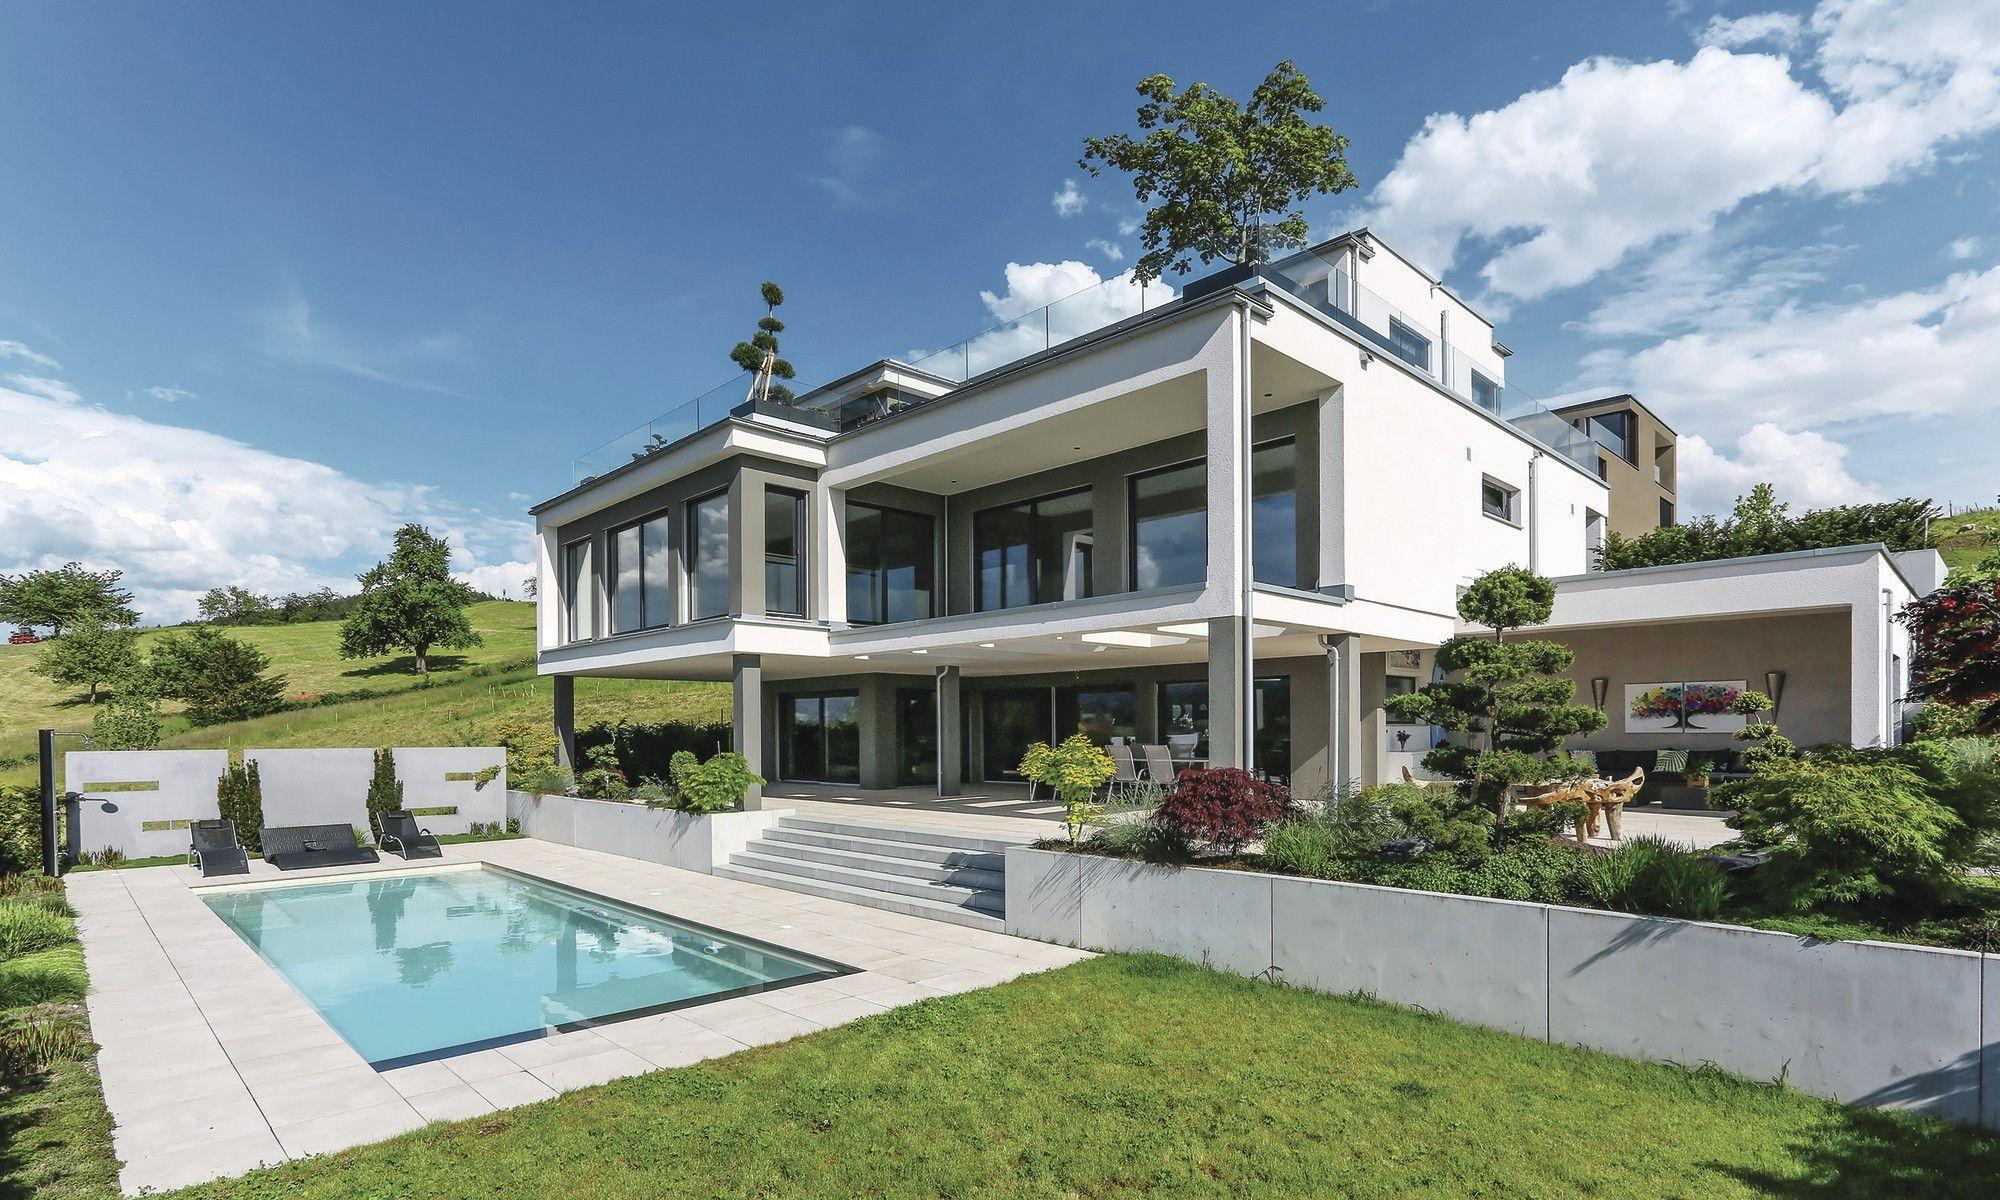 fertighaus weberhaus holzbauweise villa pool lakelucerne schweiz haus modernes. Black Bedroom Furniture Sets. Home Design Ideas